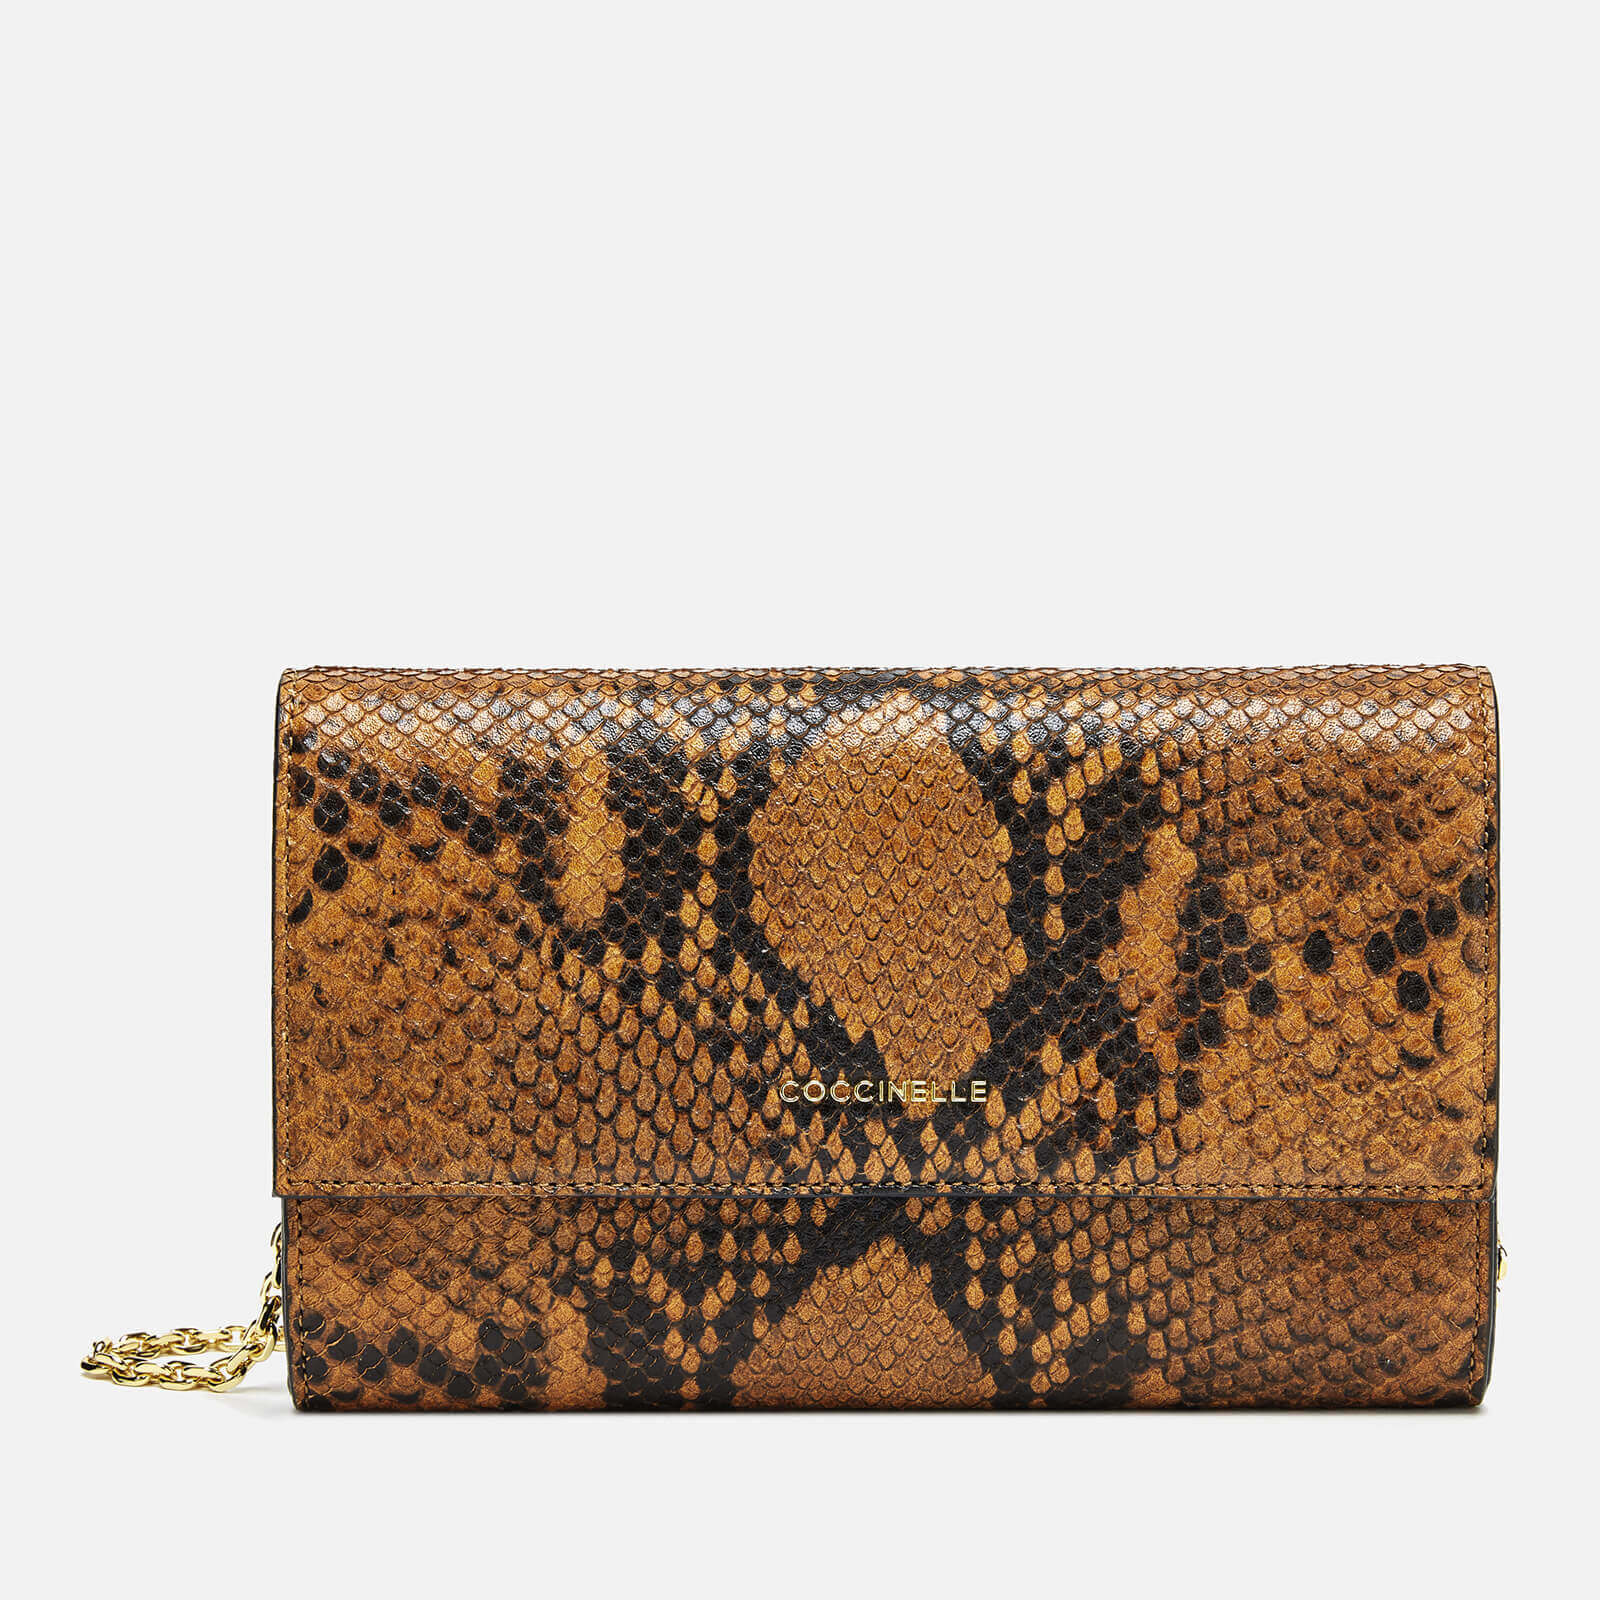 Coccinelle Women's Metallic Python Chain Bag